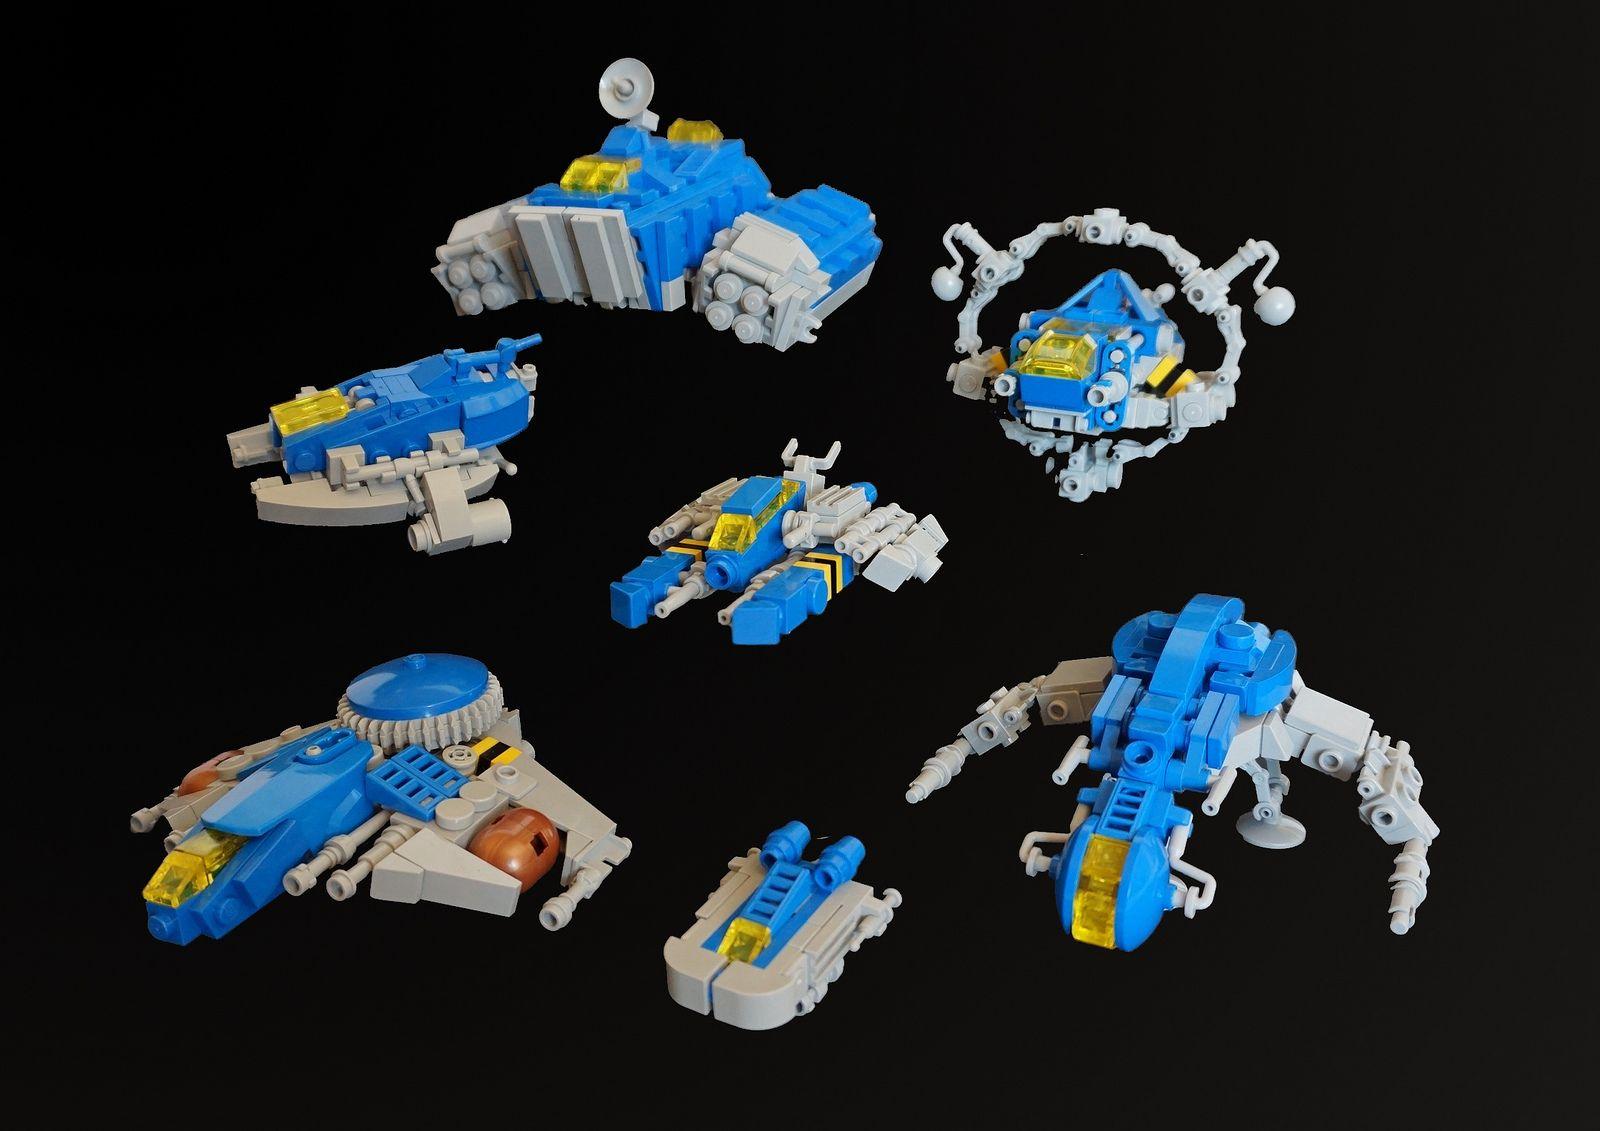 Fleet Lego